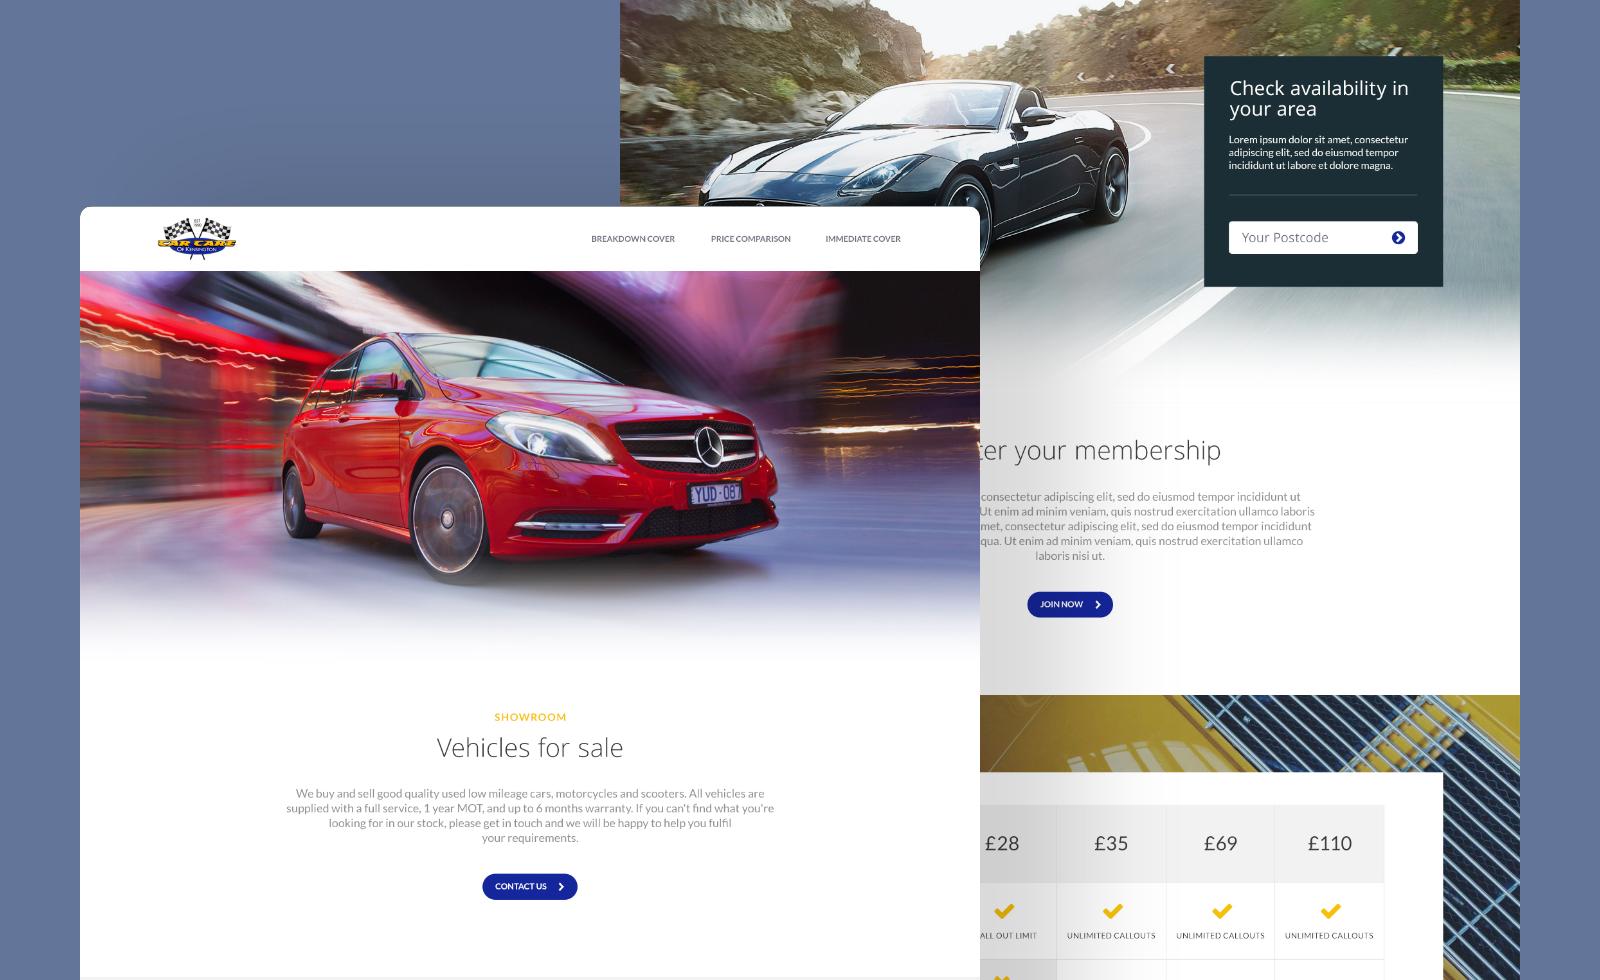 Car Care of Kensington Homepage